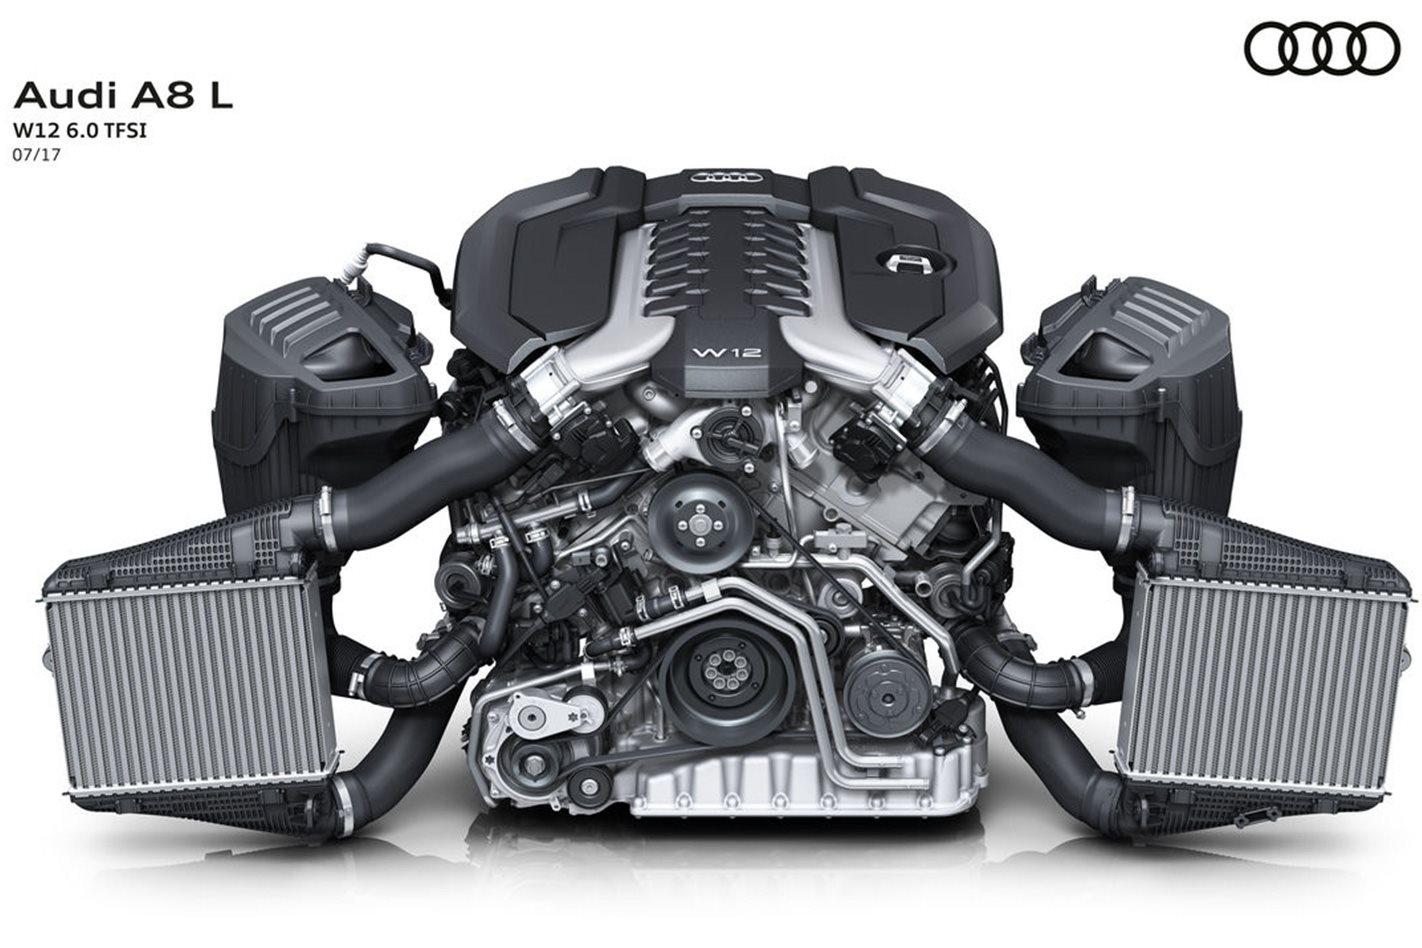 2018 Audi A8 revealed | MOTOR